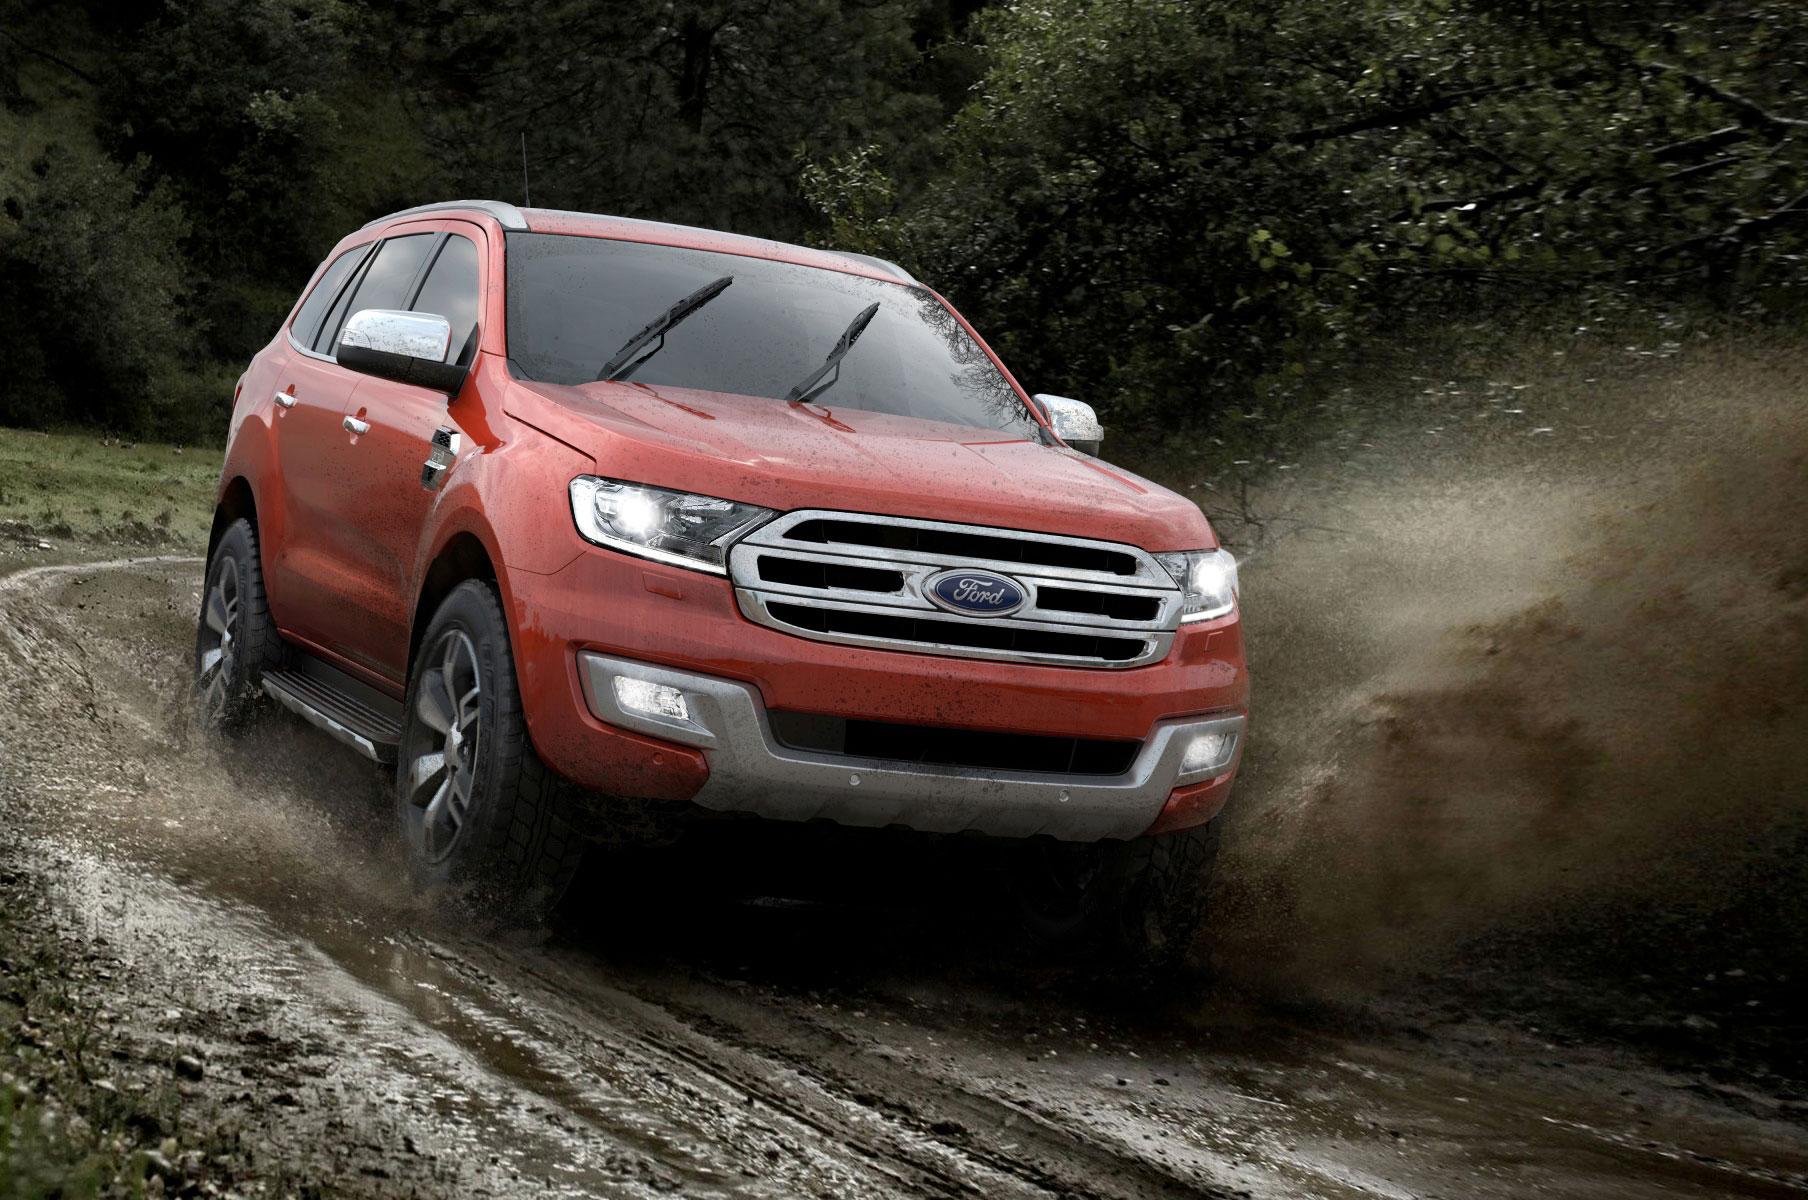 2016 Ford Everest Exterior Mud